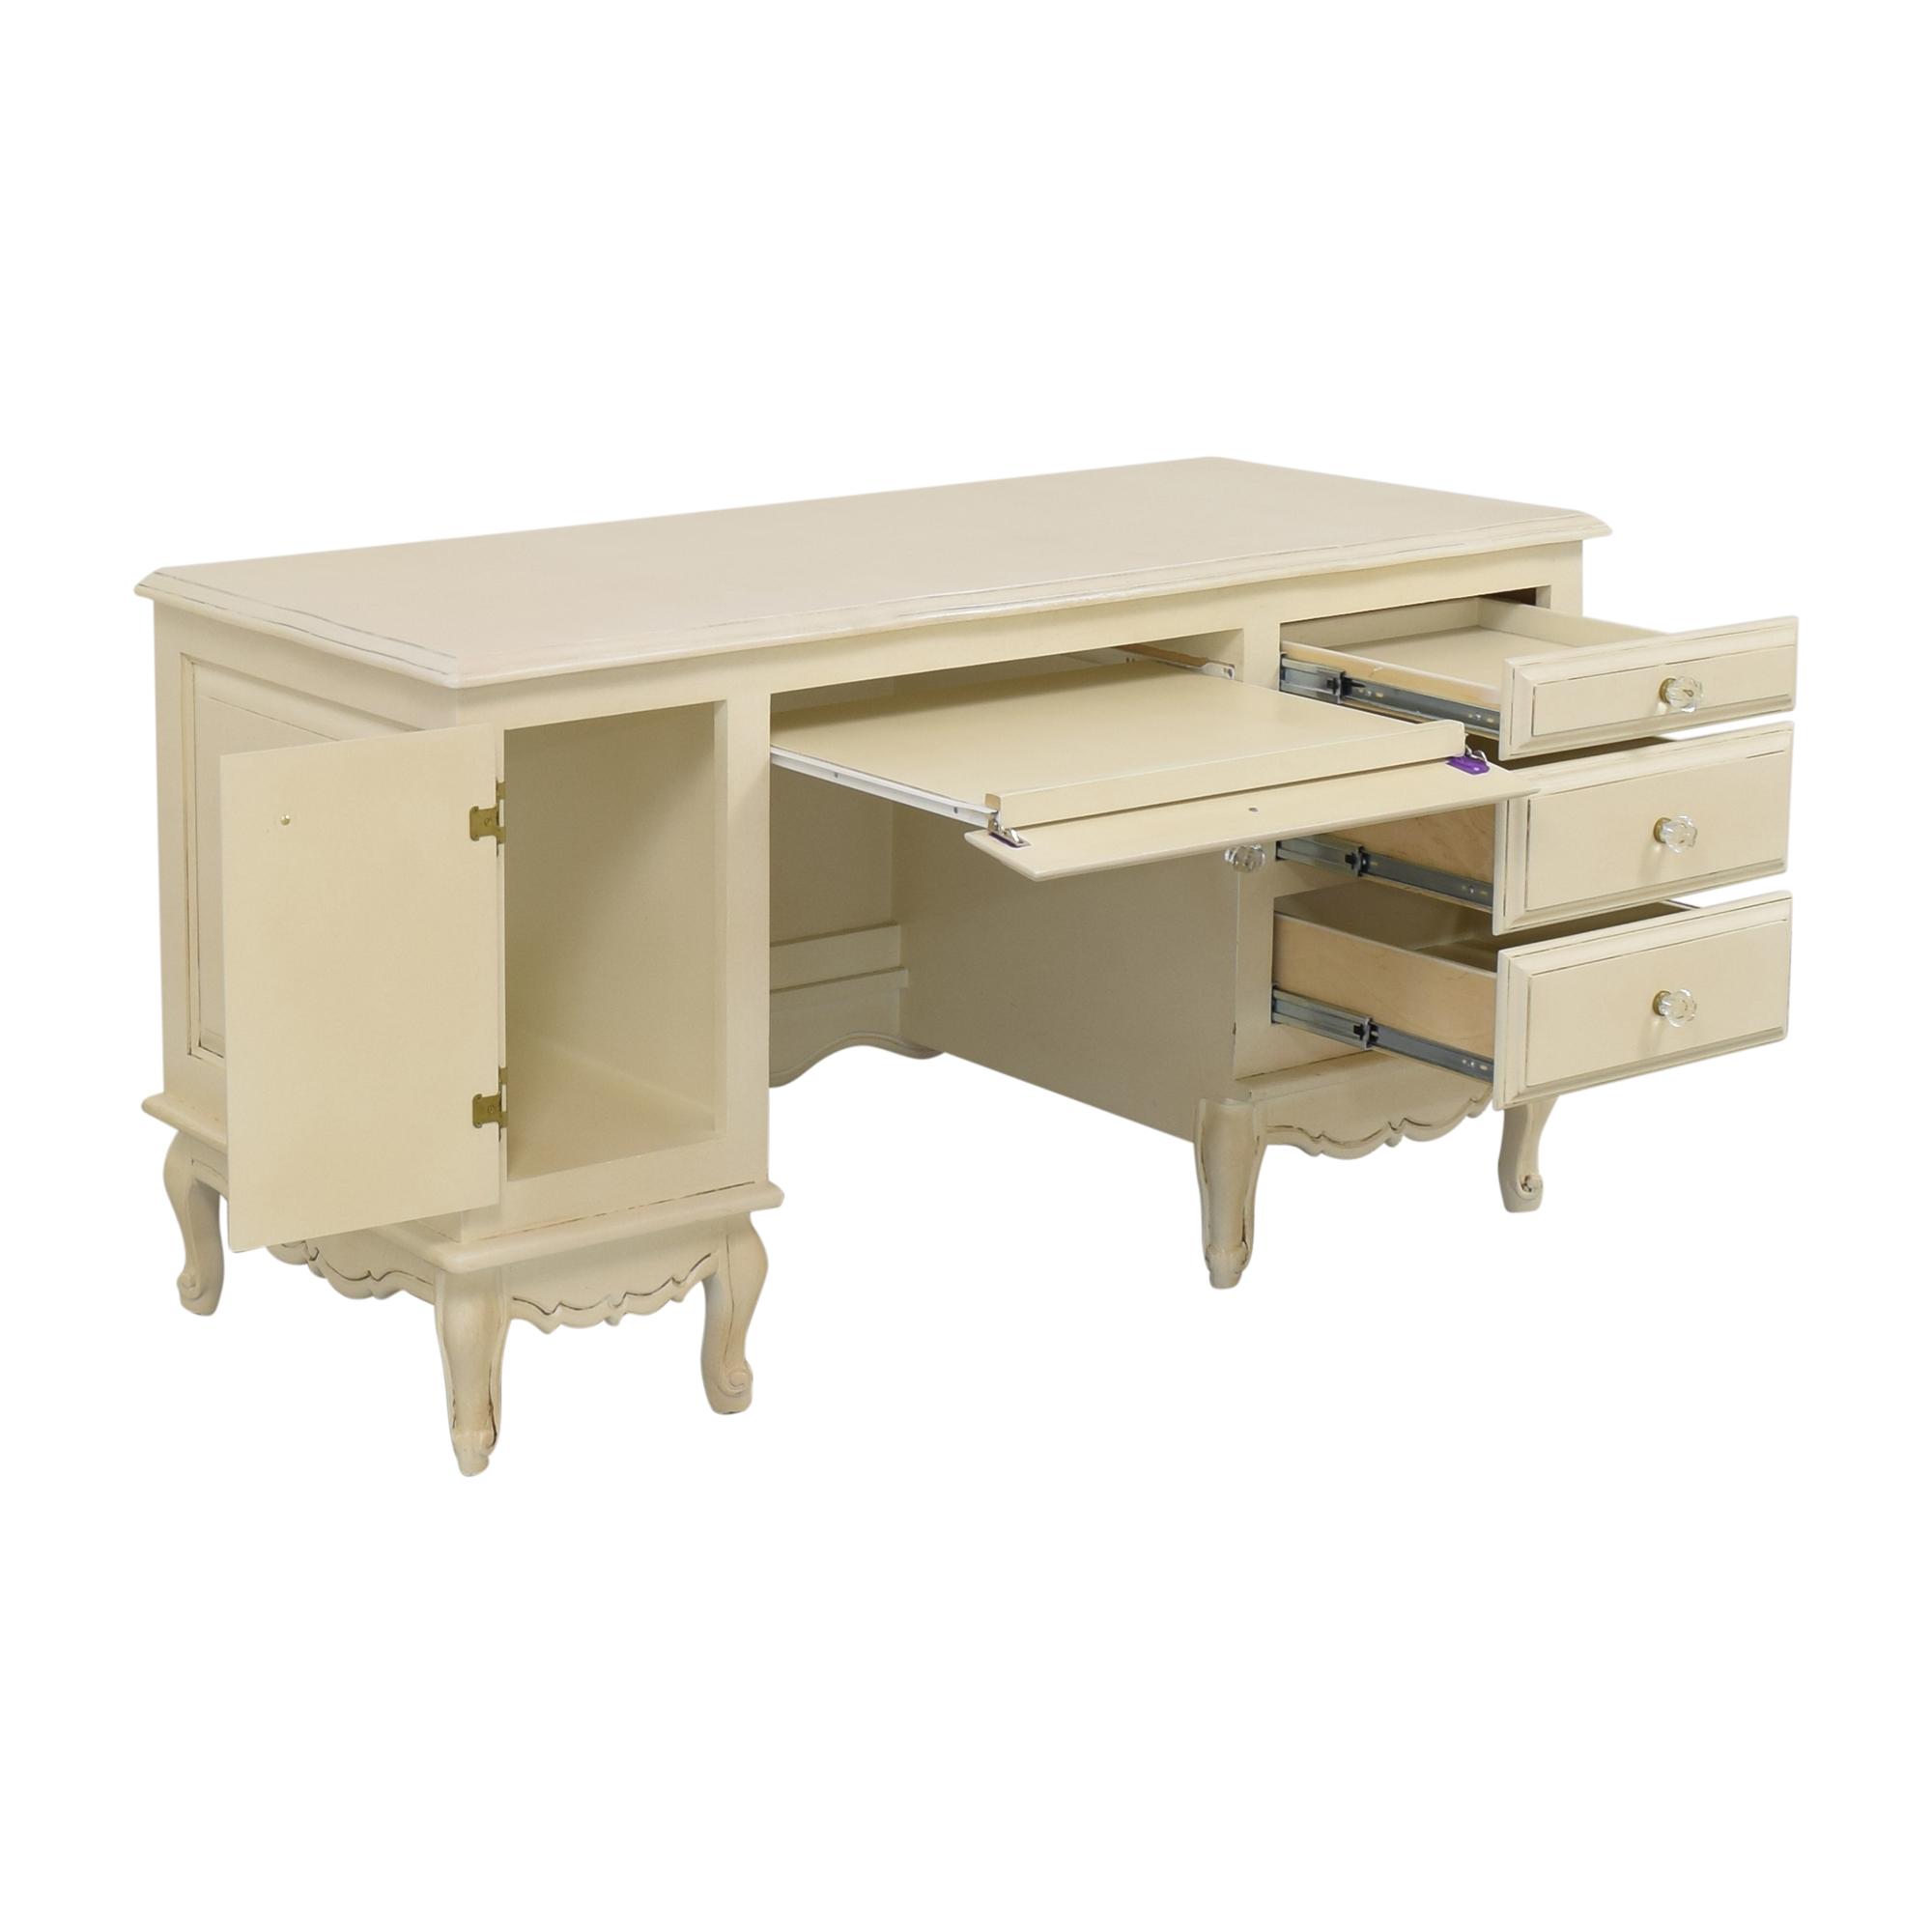 Bograd Kids Bograd Kids Desk with Cabinet and Drawers off white